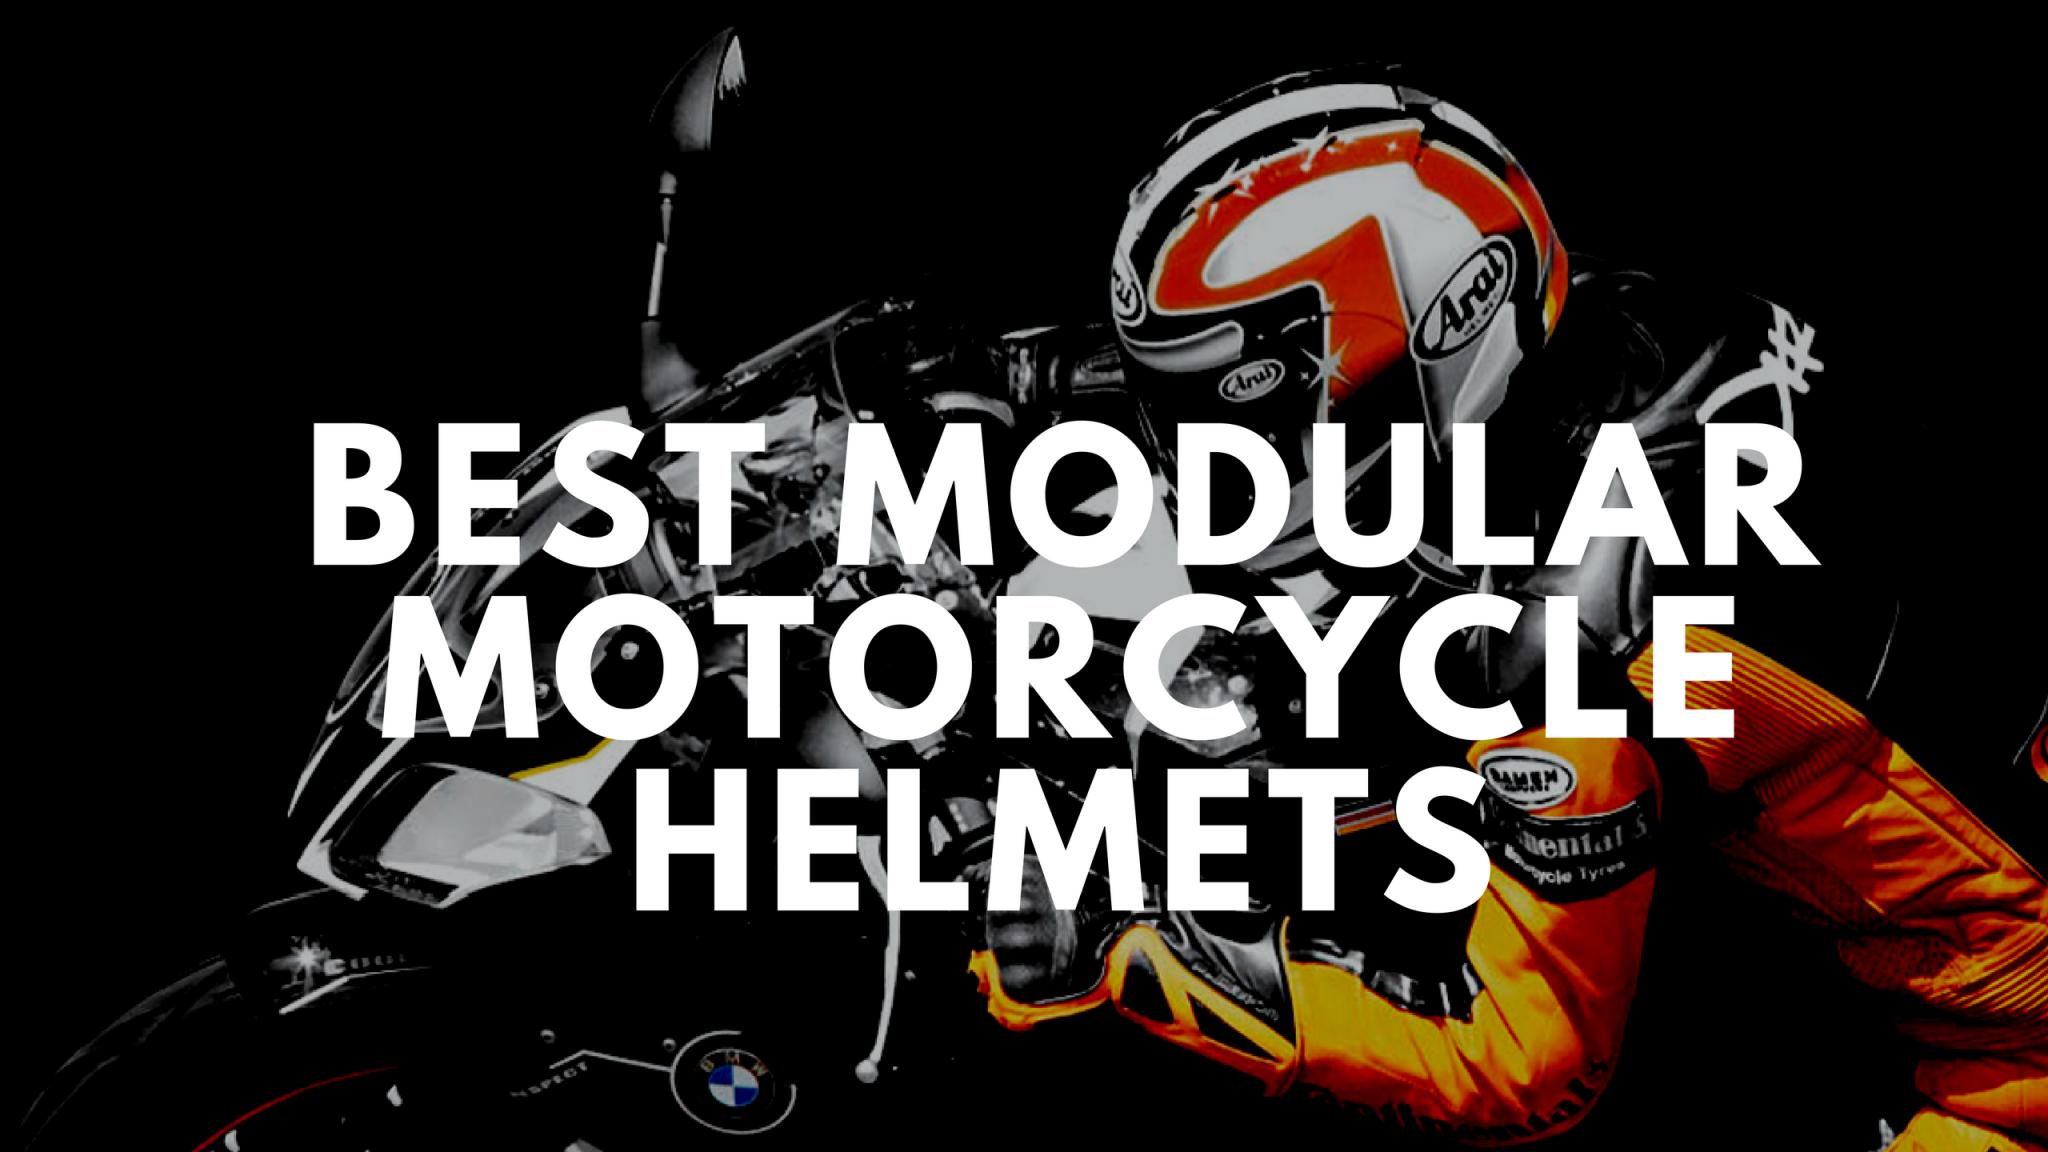 Best Modular Motorcycle Helmets